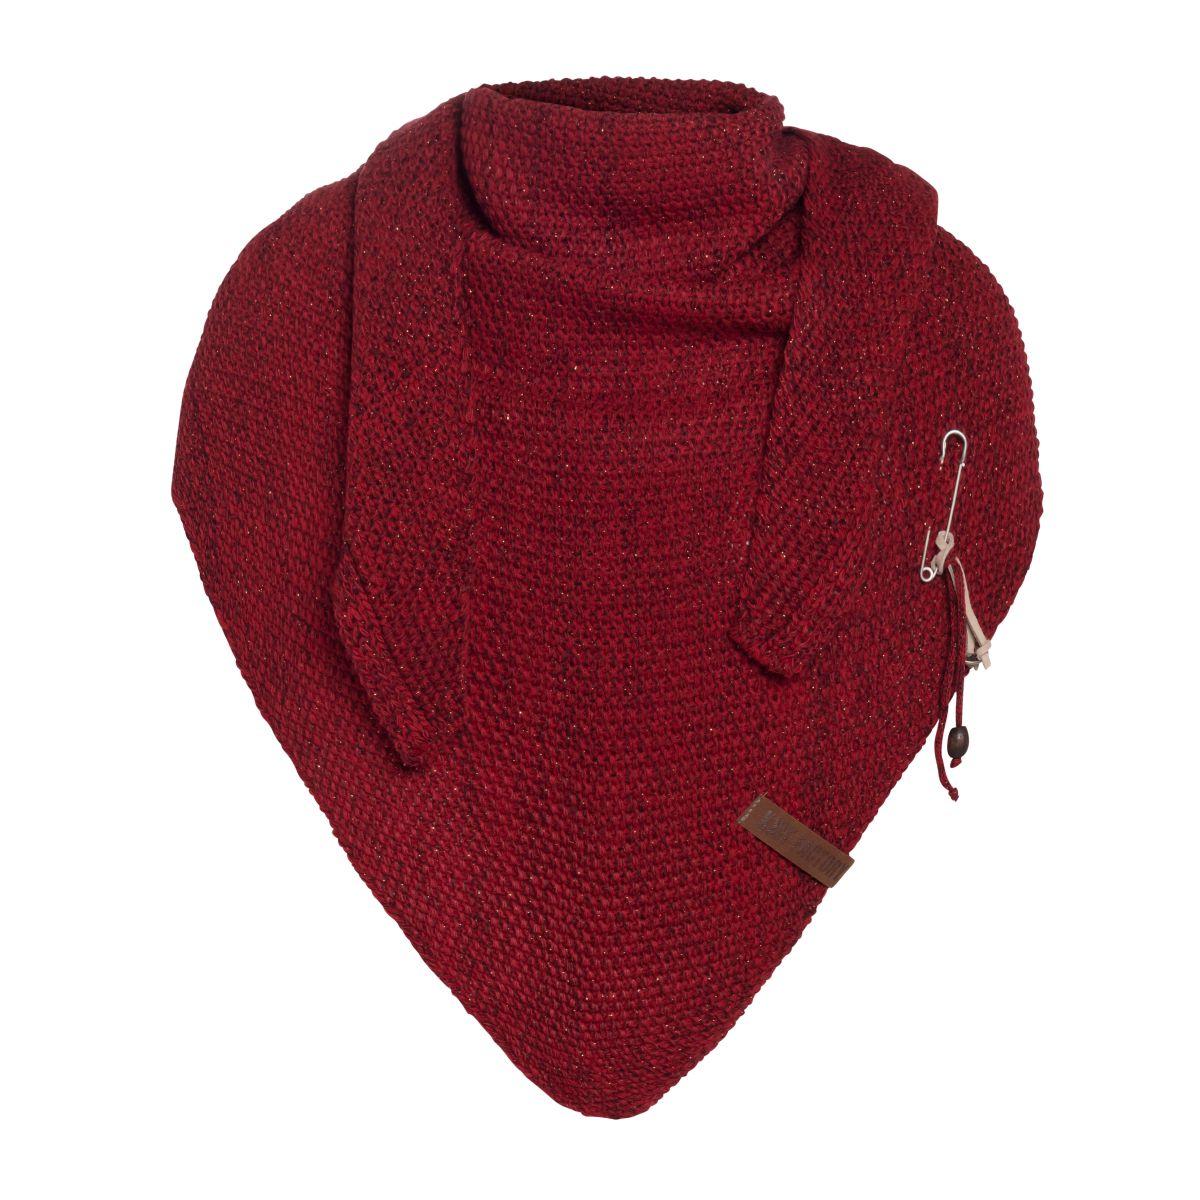 knit factory 1205803 coco omslagdoek deluxe bordeaux 1